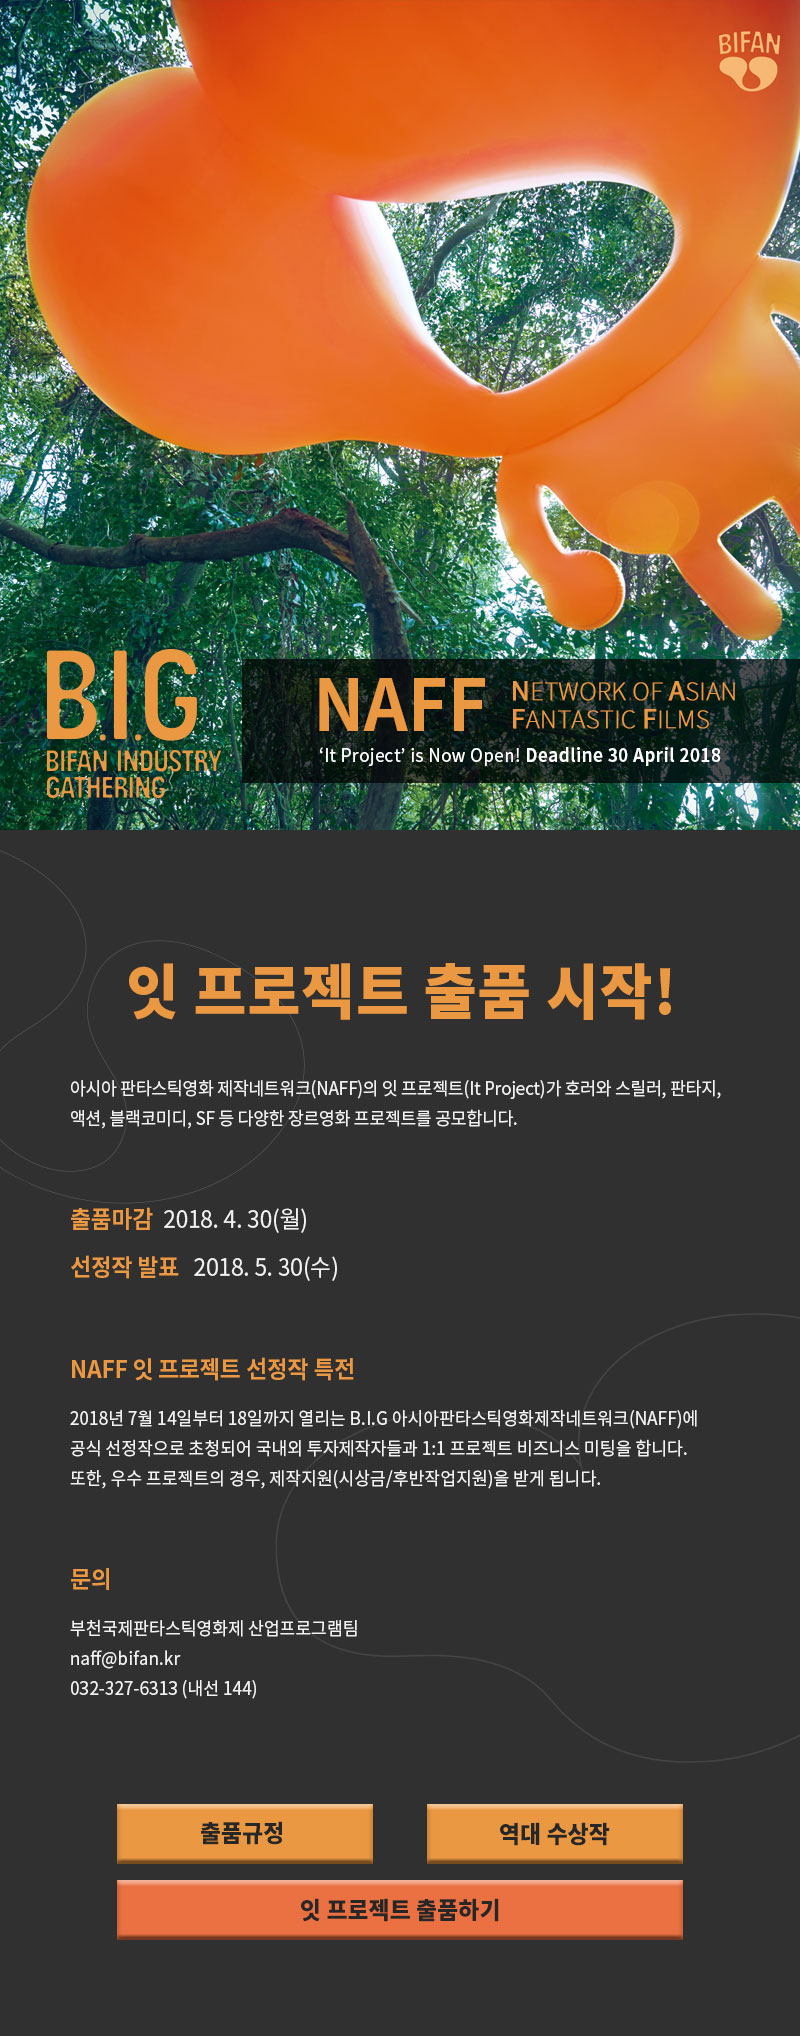 NAFF 잇 프로젝트 출품 안내